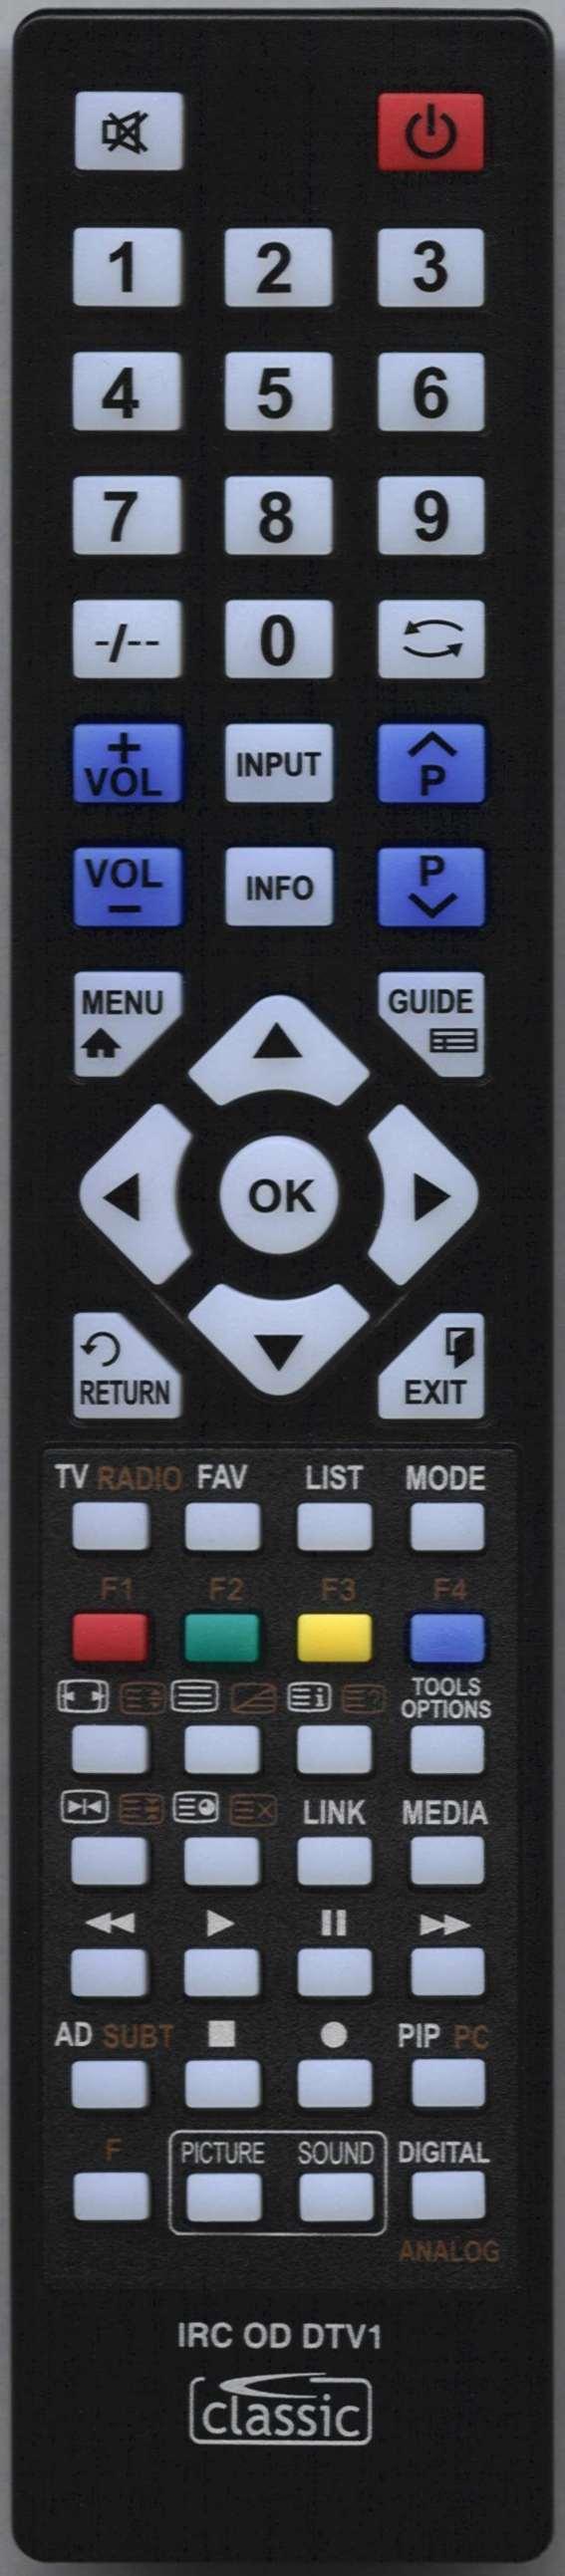 CURRY ESSENTIALS C15DVDB10U Remote Control